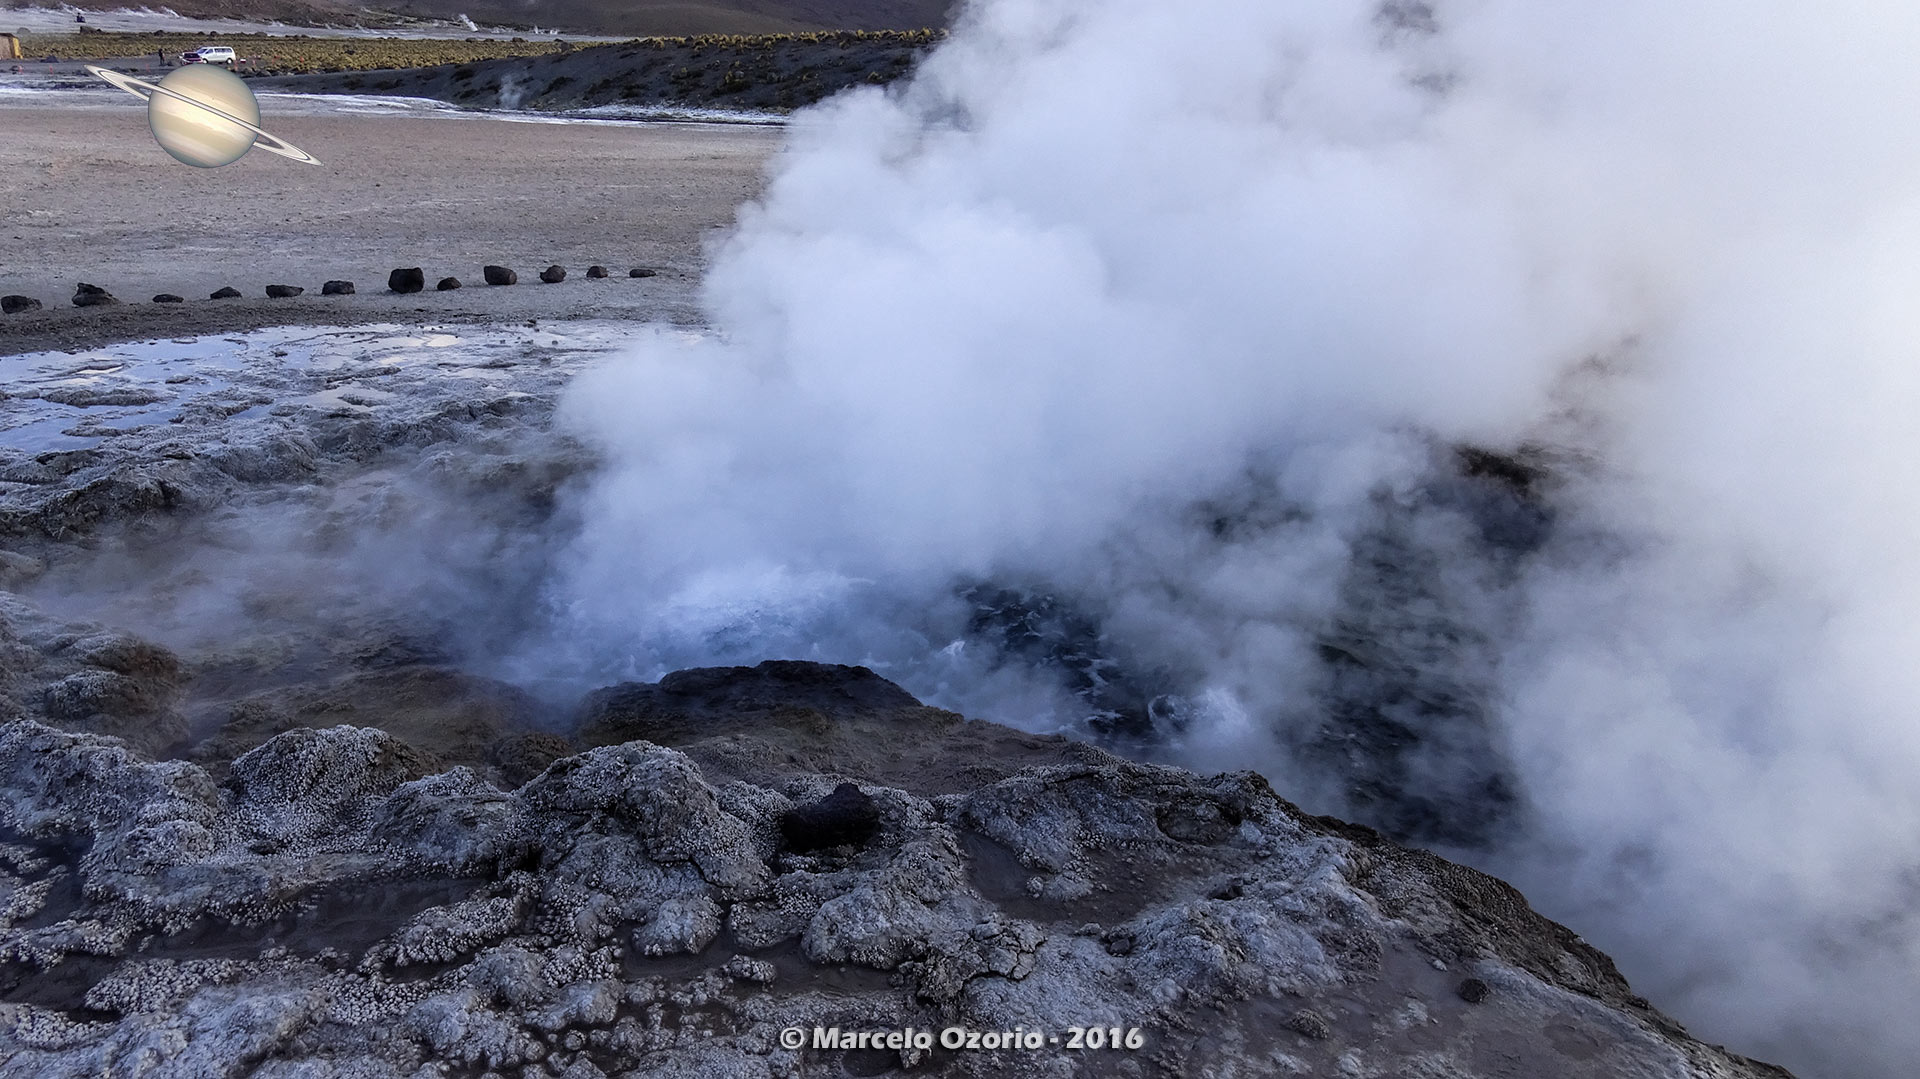 el tatio geysers atacama desert 10 - Os Surreais Gêiseres El Tatio - Deserto do Atacama - Chile